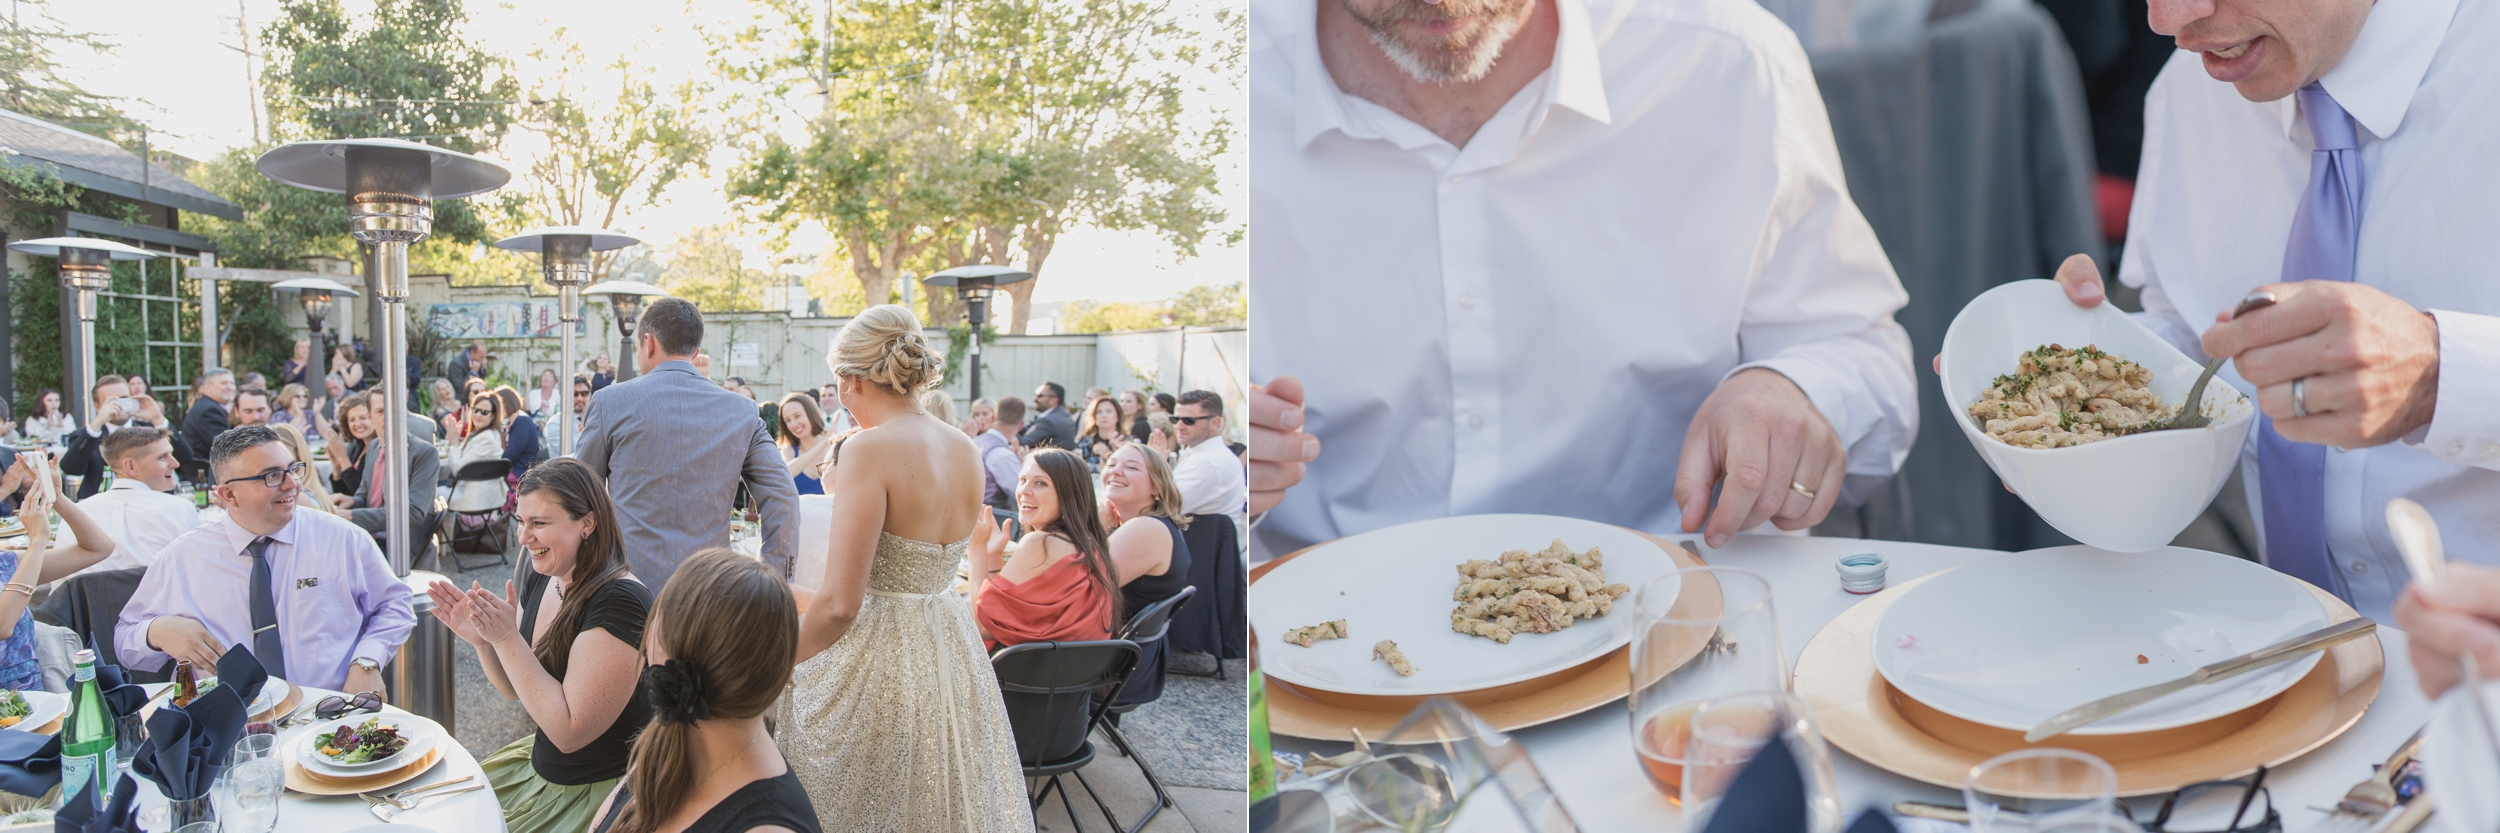 studio-333-sausalito-wedding-photographer-vc31.jpg